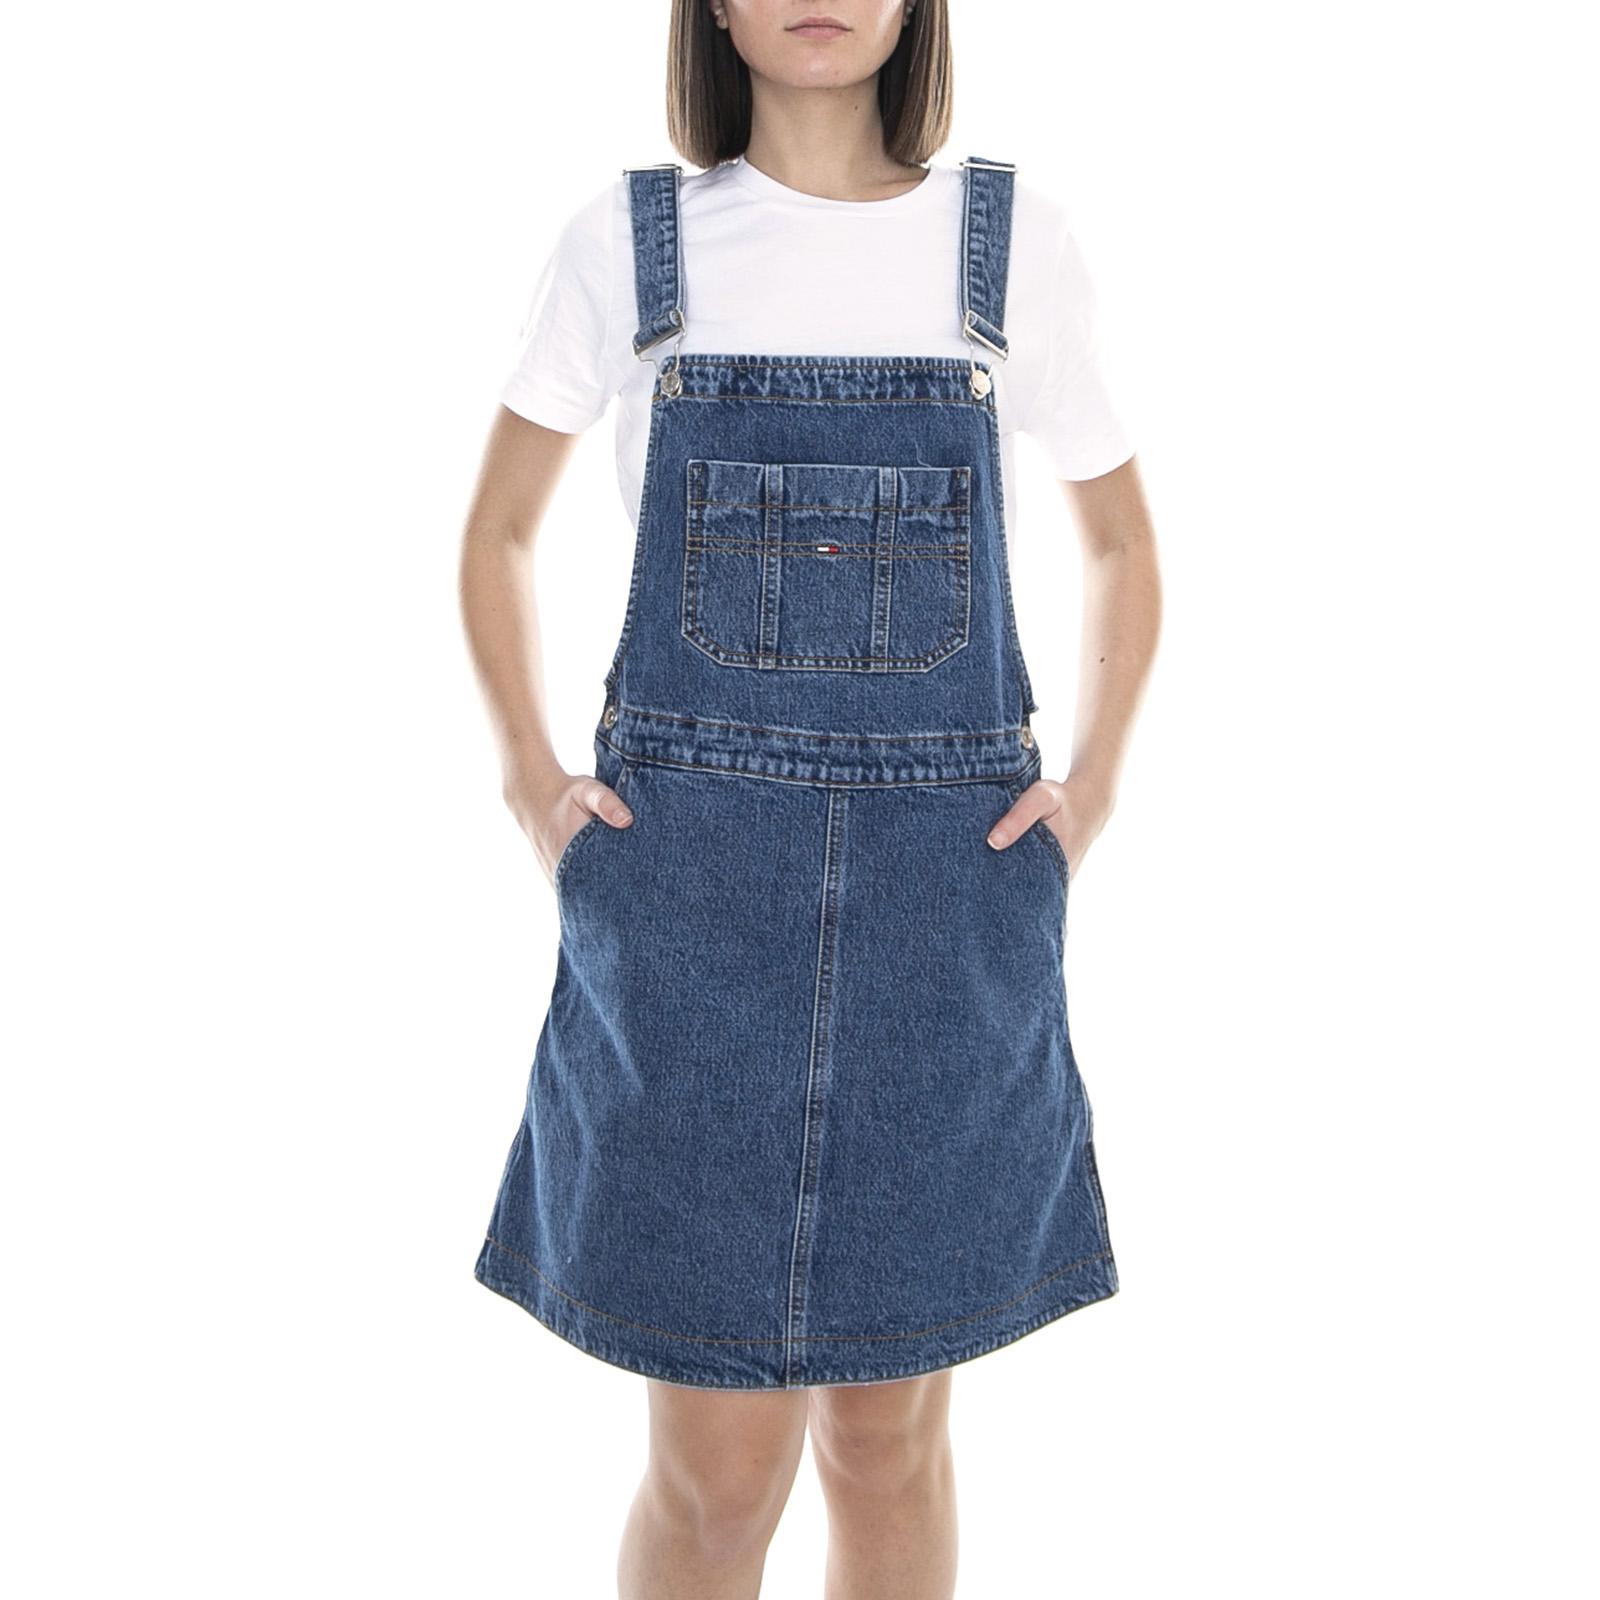 017159e9a8f9a2 Tommy Hilfiger Latzhose Tjw um Linie Latzhose Kleid Gough Mitte blau Damen  Jeans Denim Latzhose